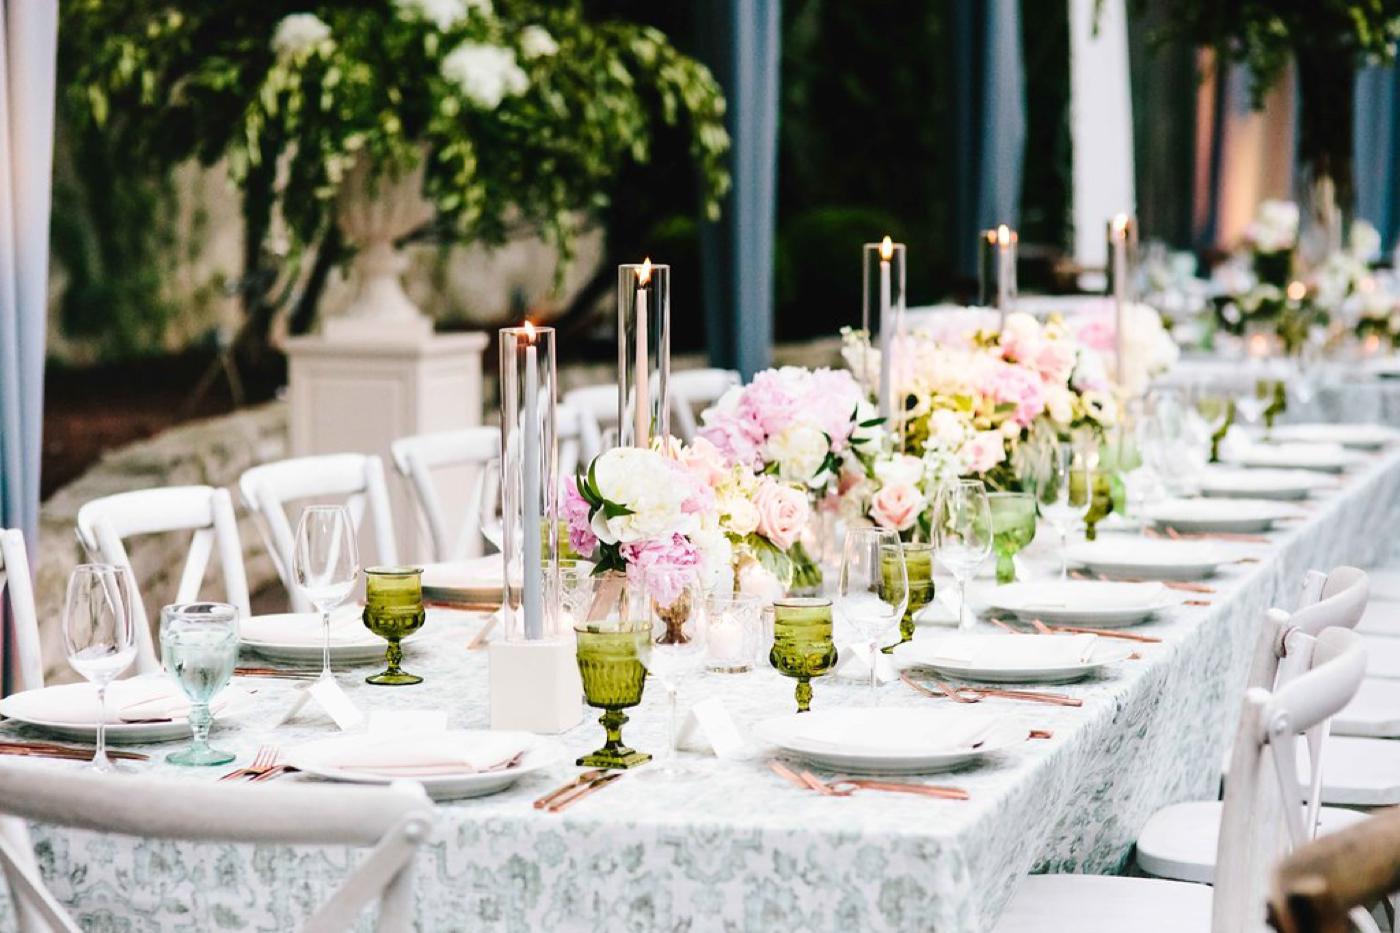 chicago-fine-art-wedding-photography-sakamuri74